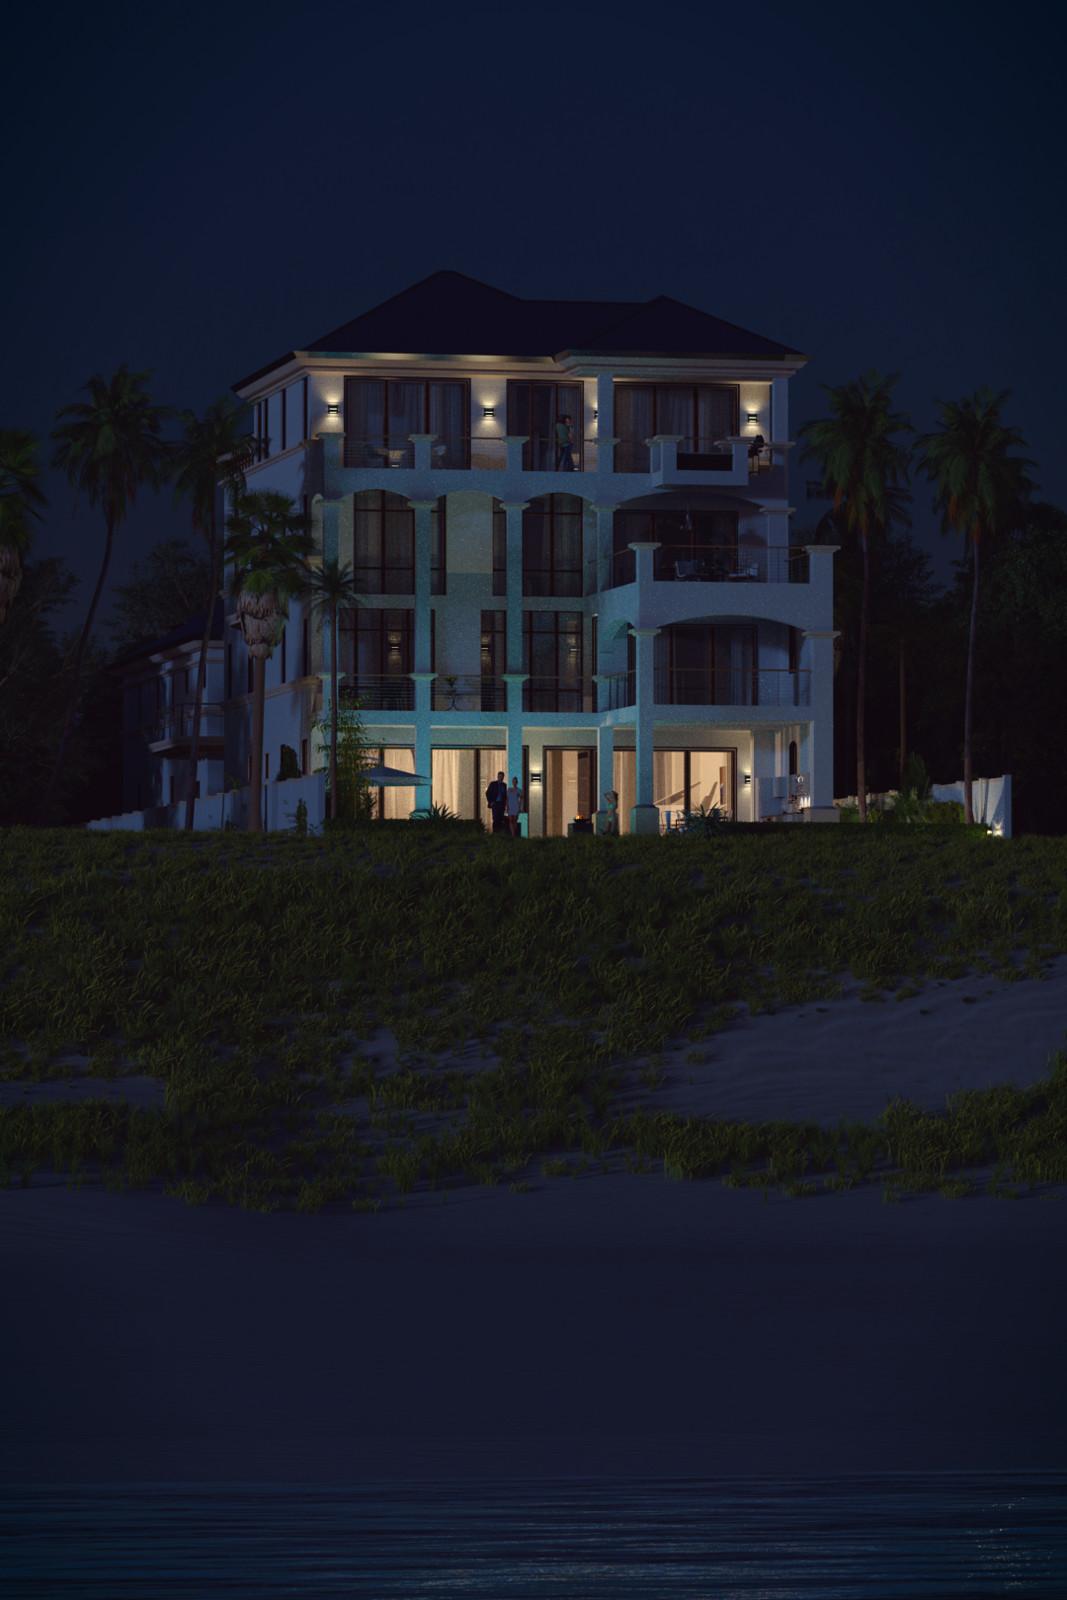 SketchUp + Thea Render  Seagrove Beach House: From Water 02 Night A Lumina 1080 × 1620 Presto MC Bucket